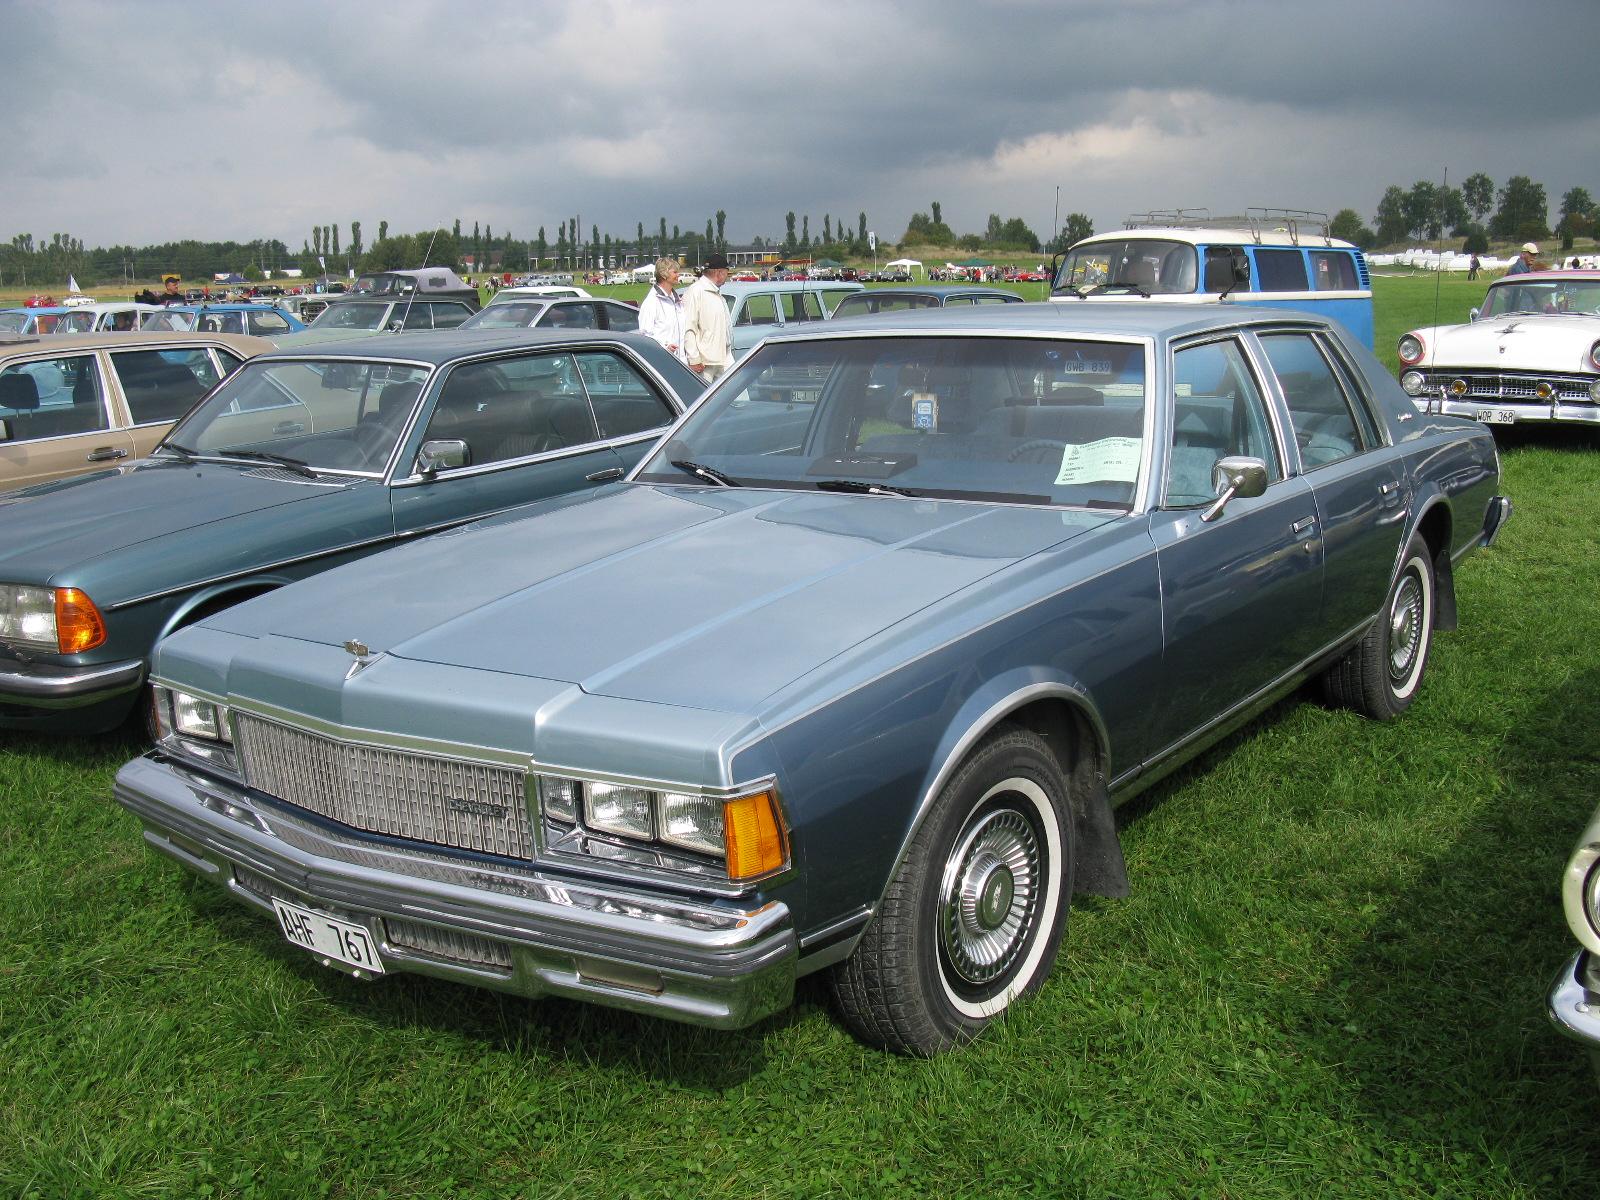 File:Chevrolet Caprice Classic 1977 (7998138642) jpg - Wikimedia Commons